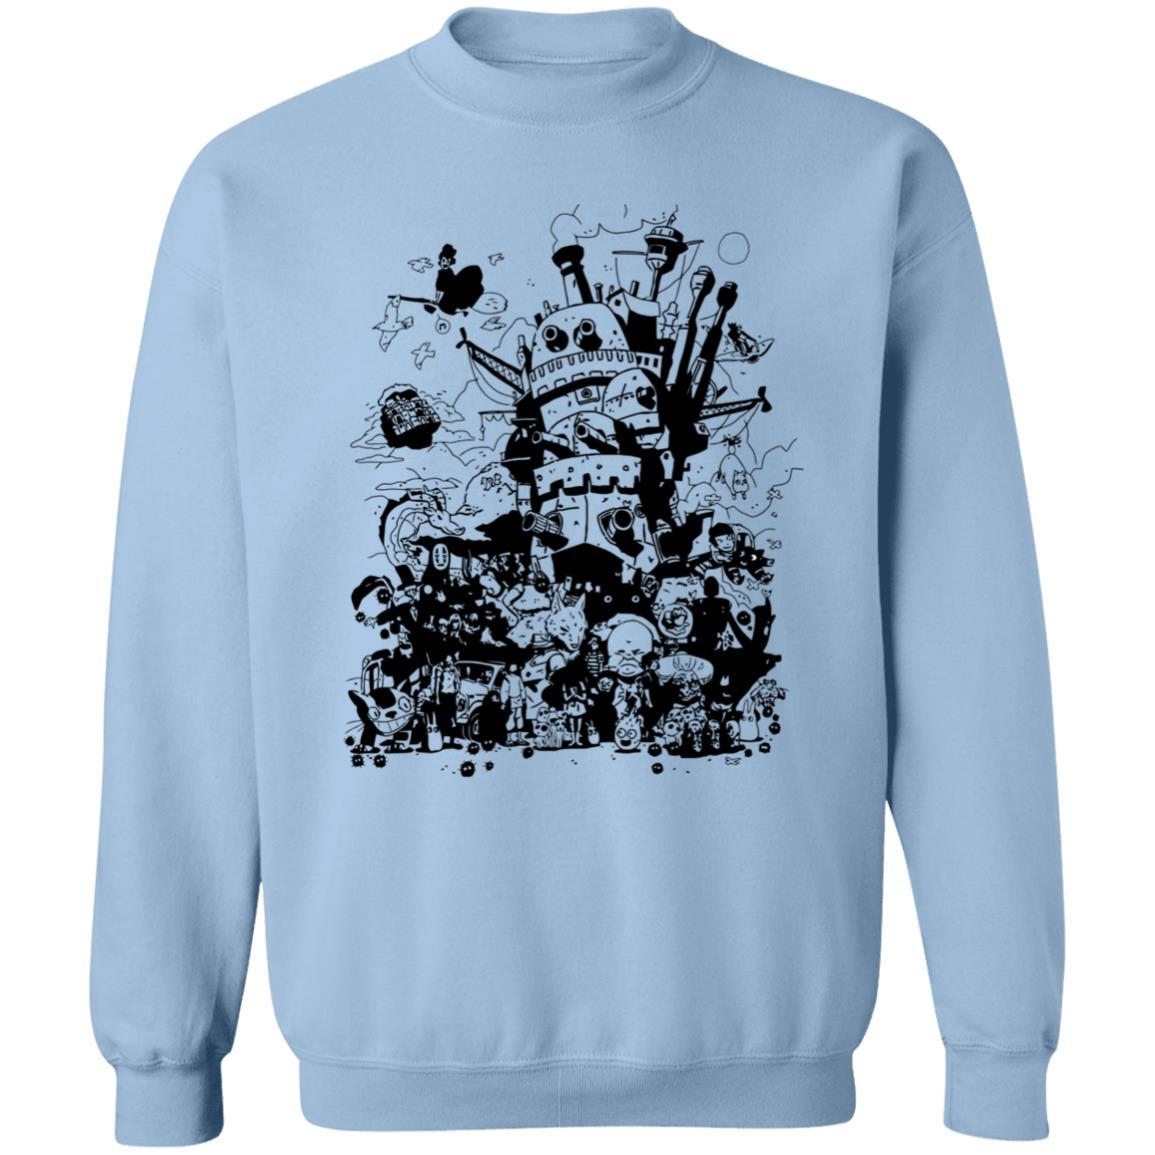 Studio Ghibli Art Collection Black and White Sweatshirt